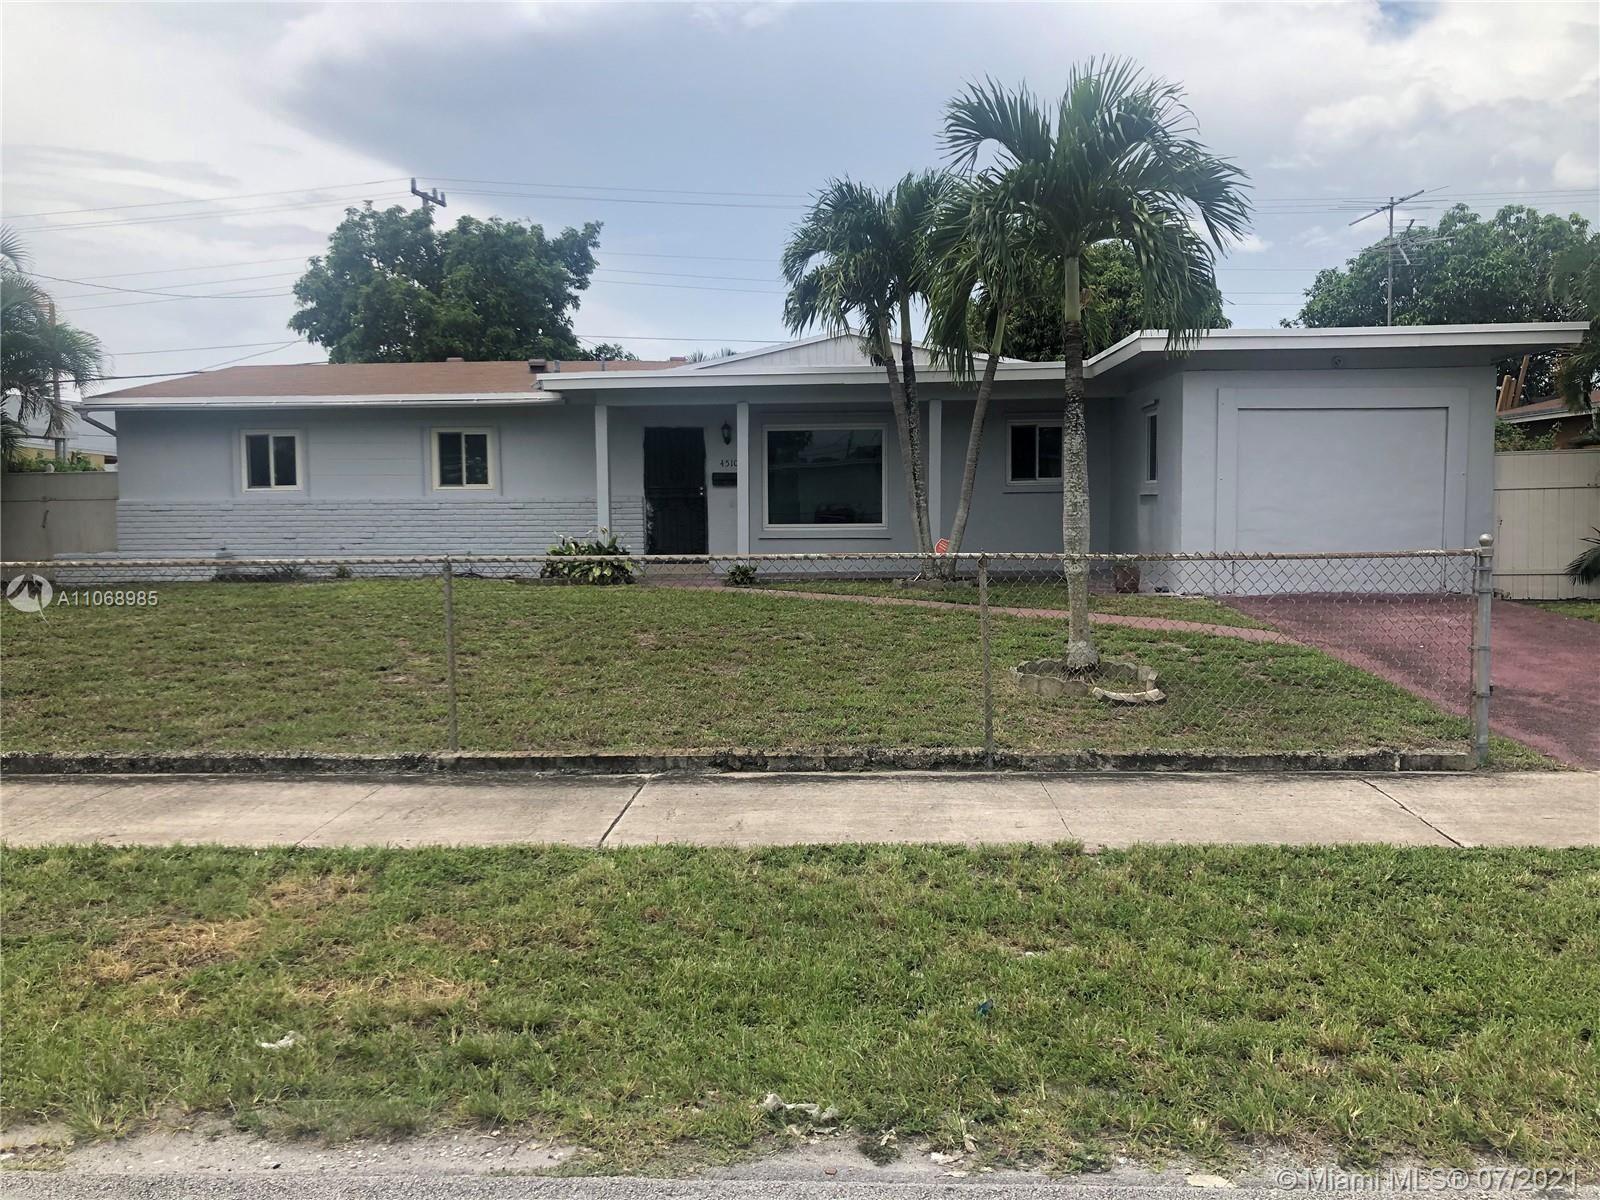 4510 NW 168th Ter, Miami Gardens, FL 33055 - #: A11068985